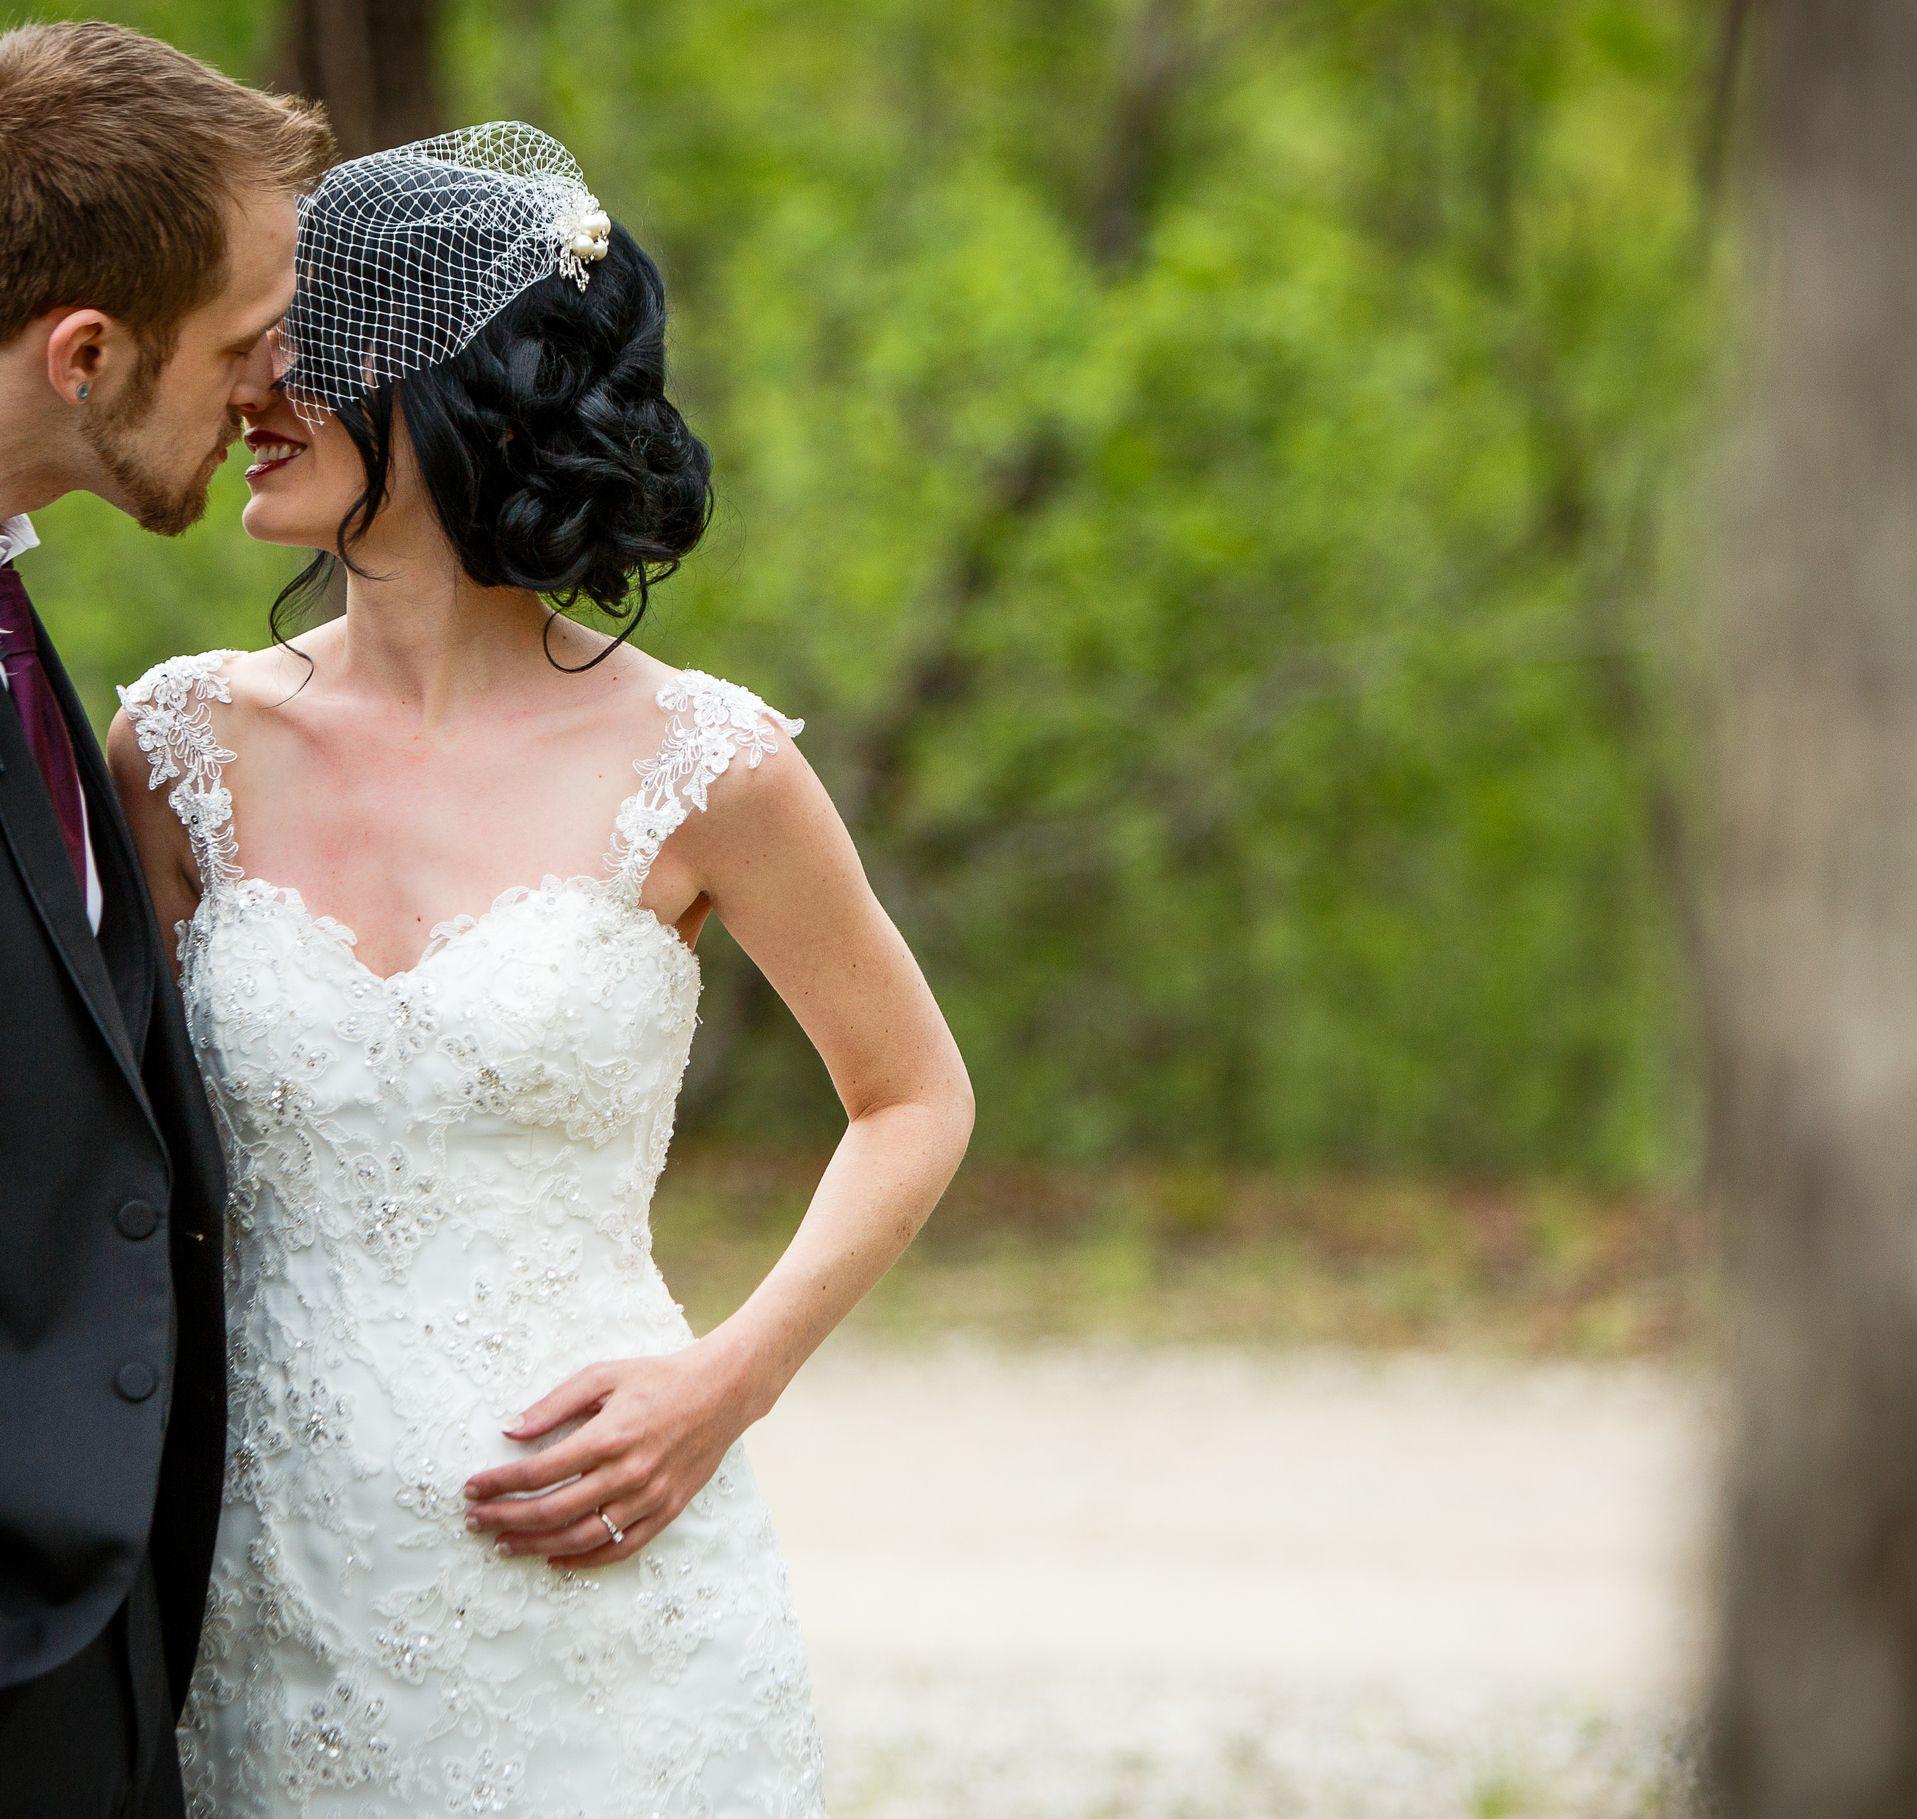 Wedding hairstyle for medium length hair with a birdcage ...